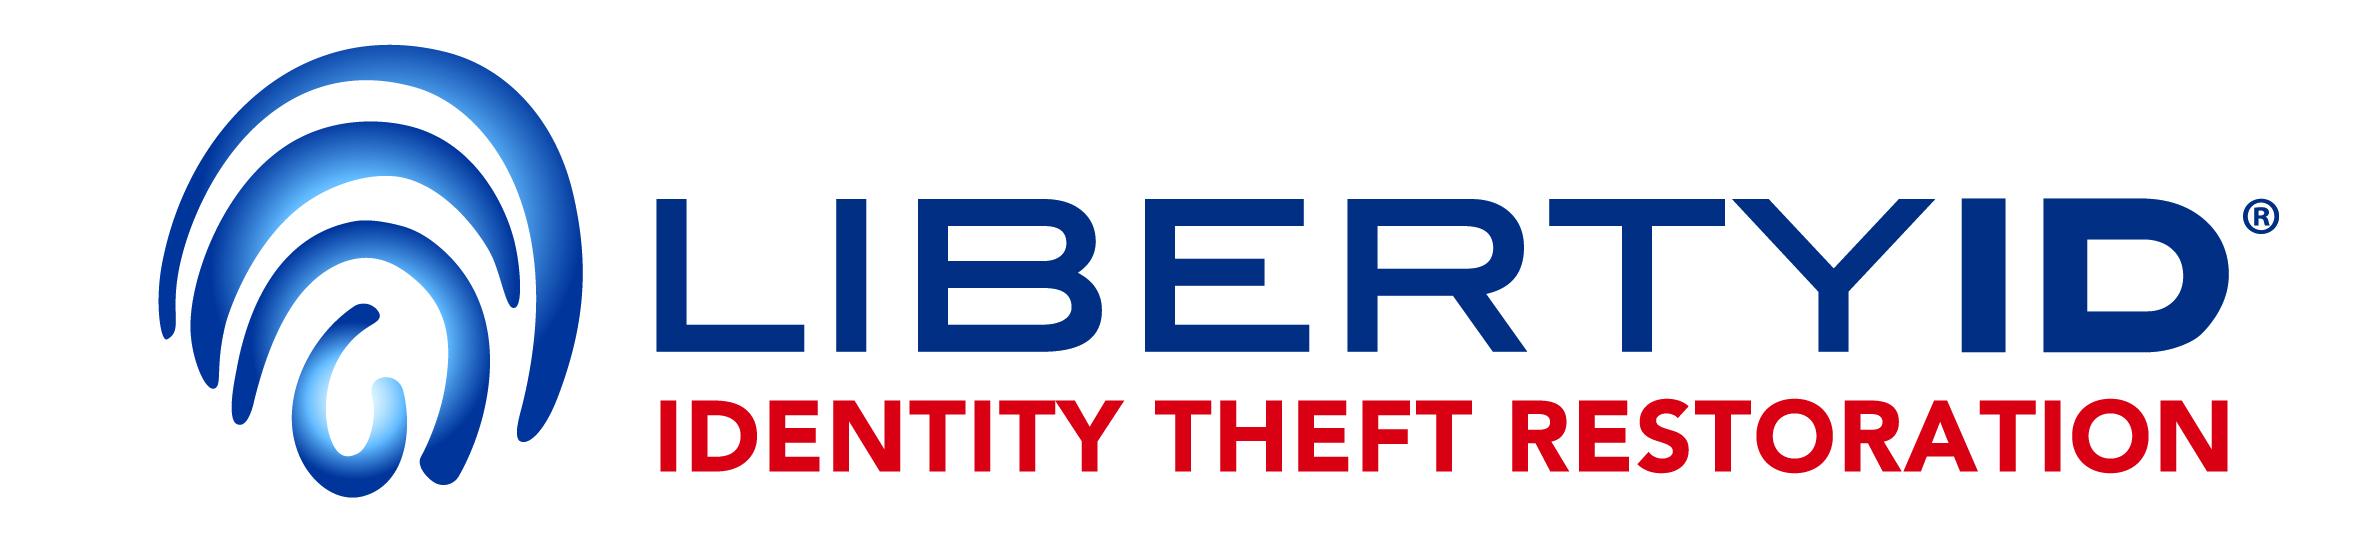 LibertyID_ID Theft Restoration Logo_Horizontal_Tagline_FullColor.jpg